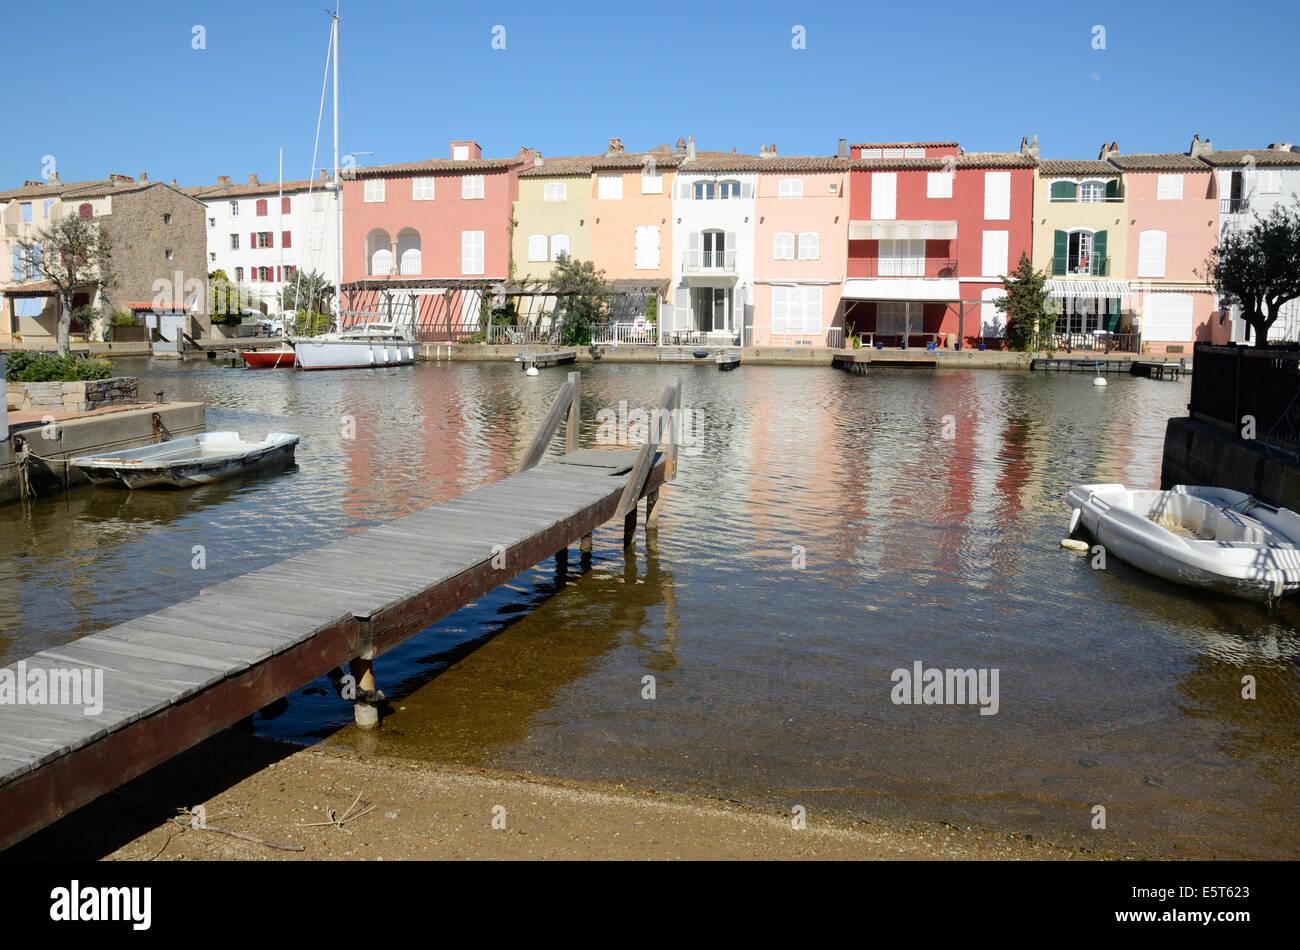 Waterside Houses at Port Grimaud Resort Town Var Côte d'Azur France - Stock Image